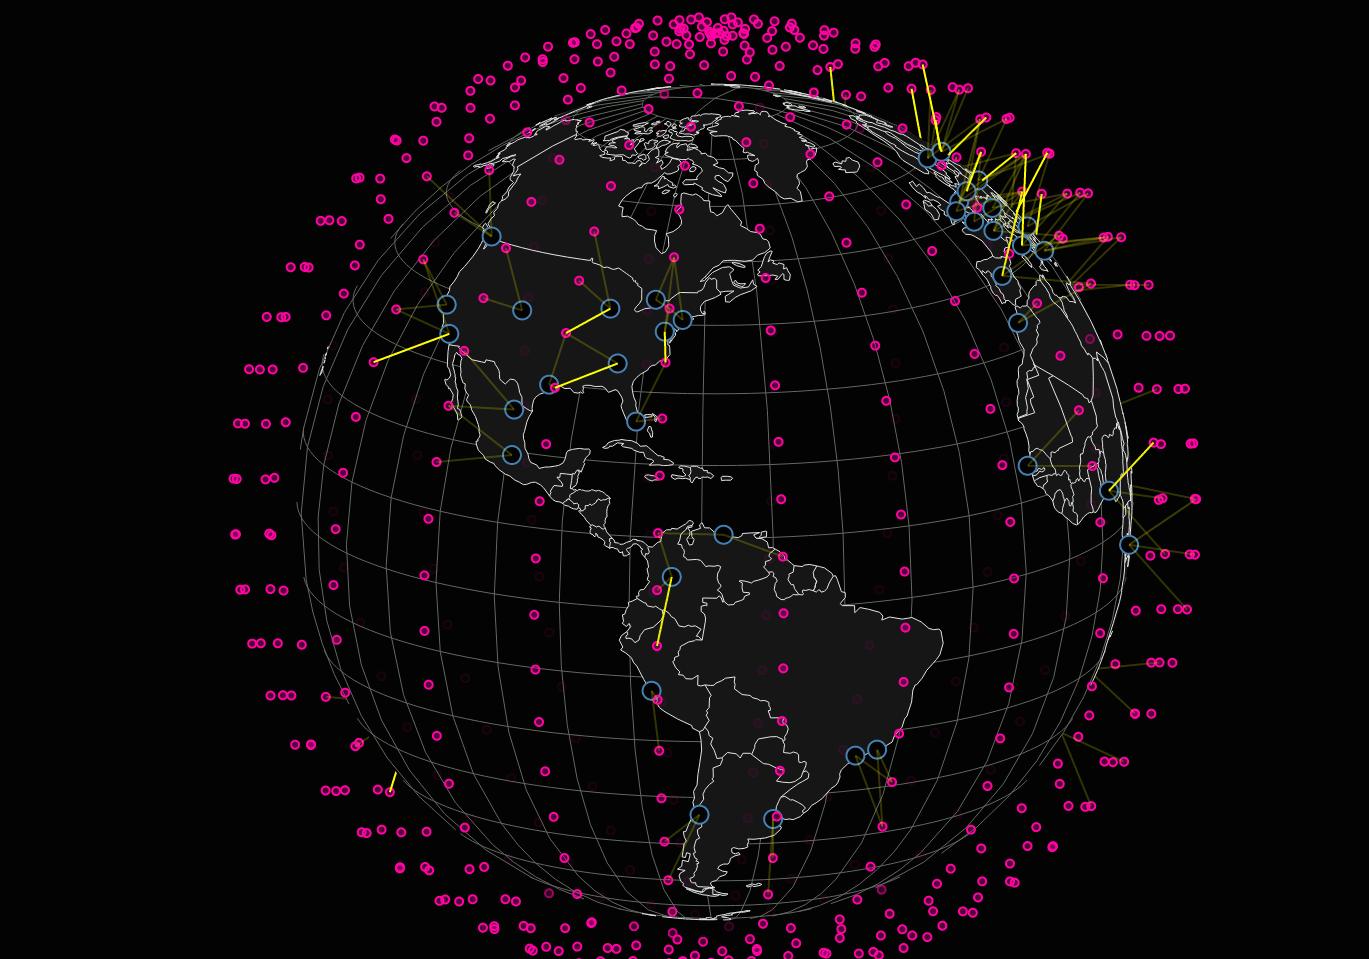 satellitenetwork